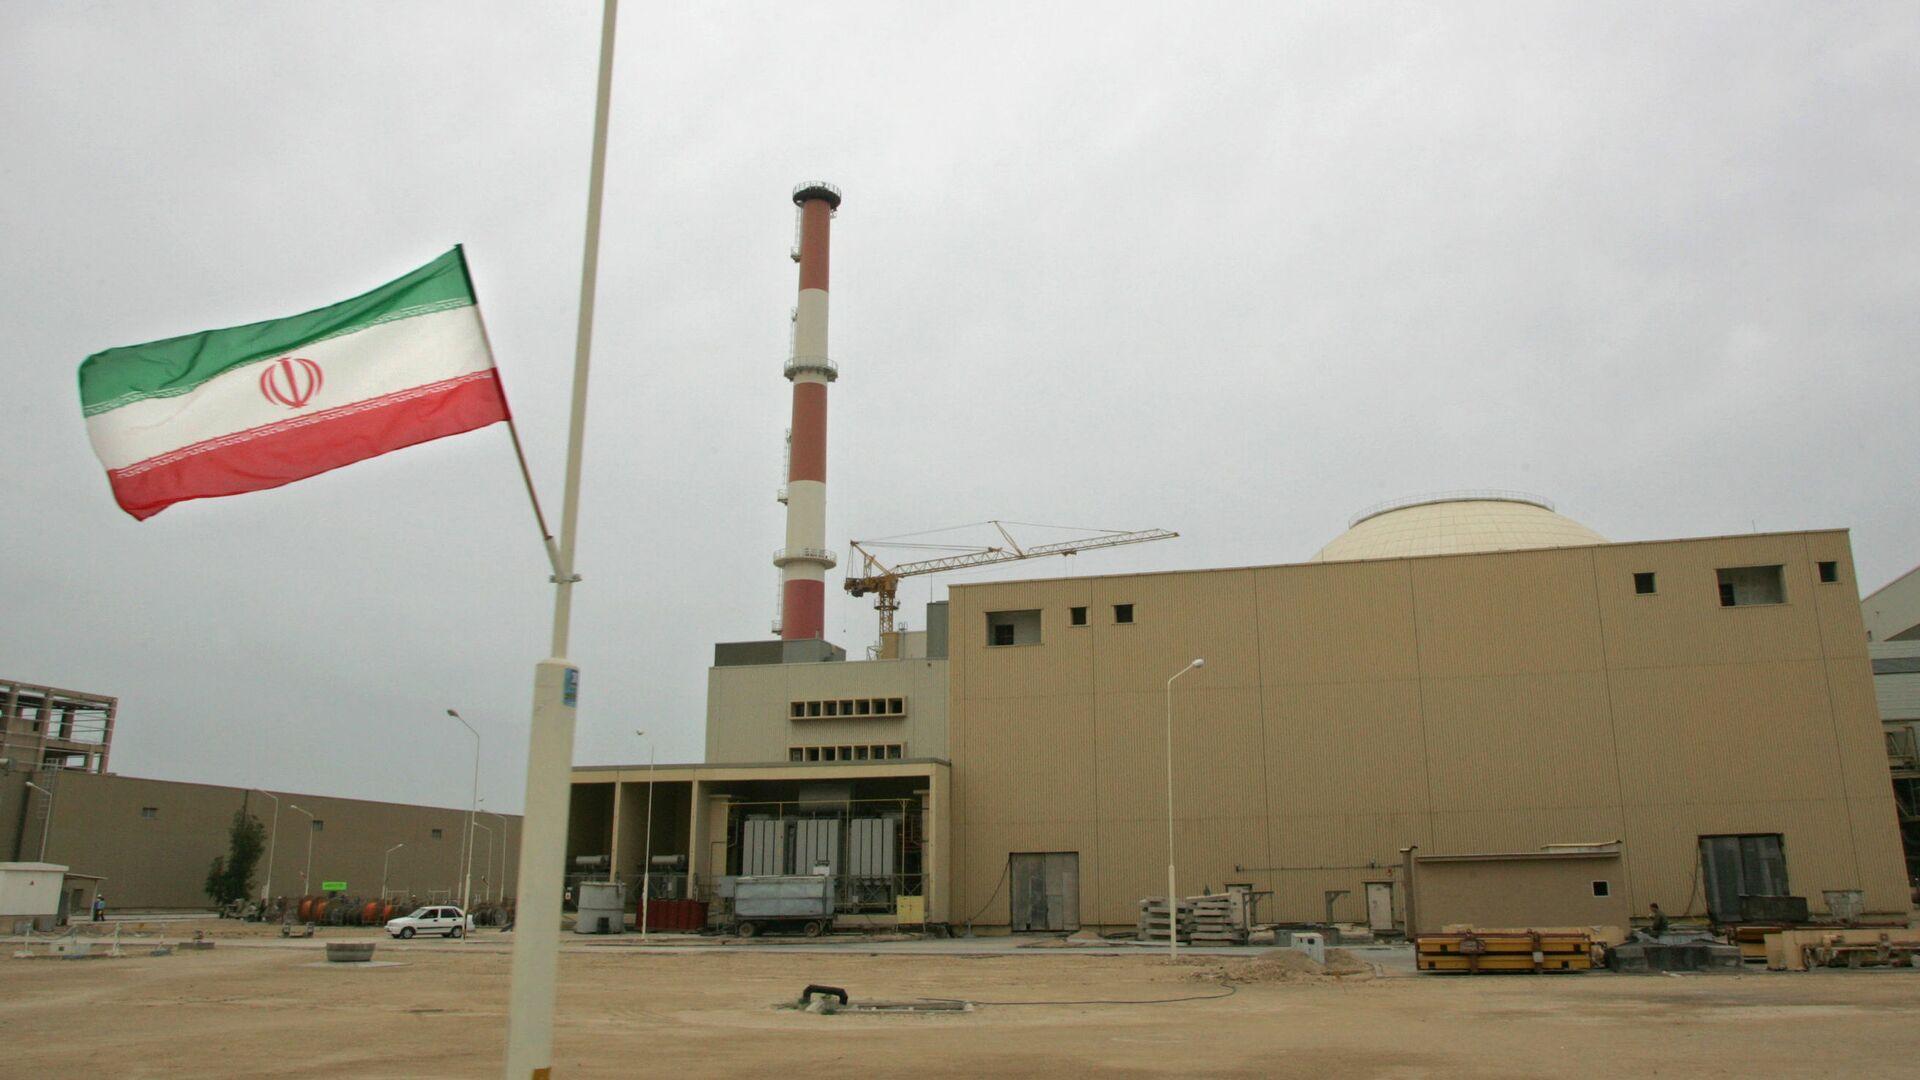 La bandera de Irán junto a la planta nuclear de Bushehr - Sputnik Mundo, 1920, 01.02.2021